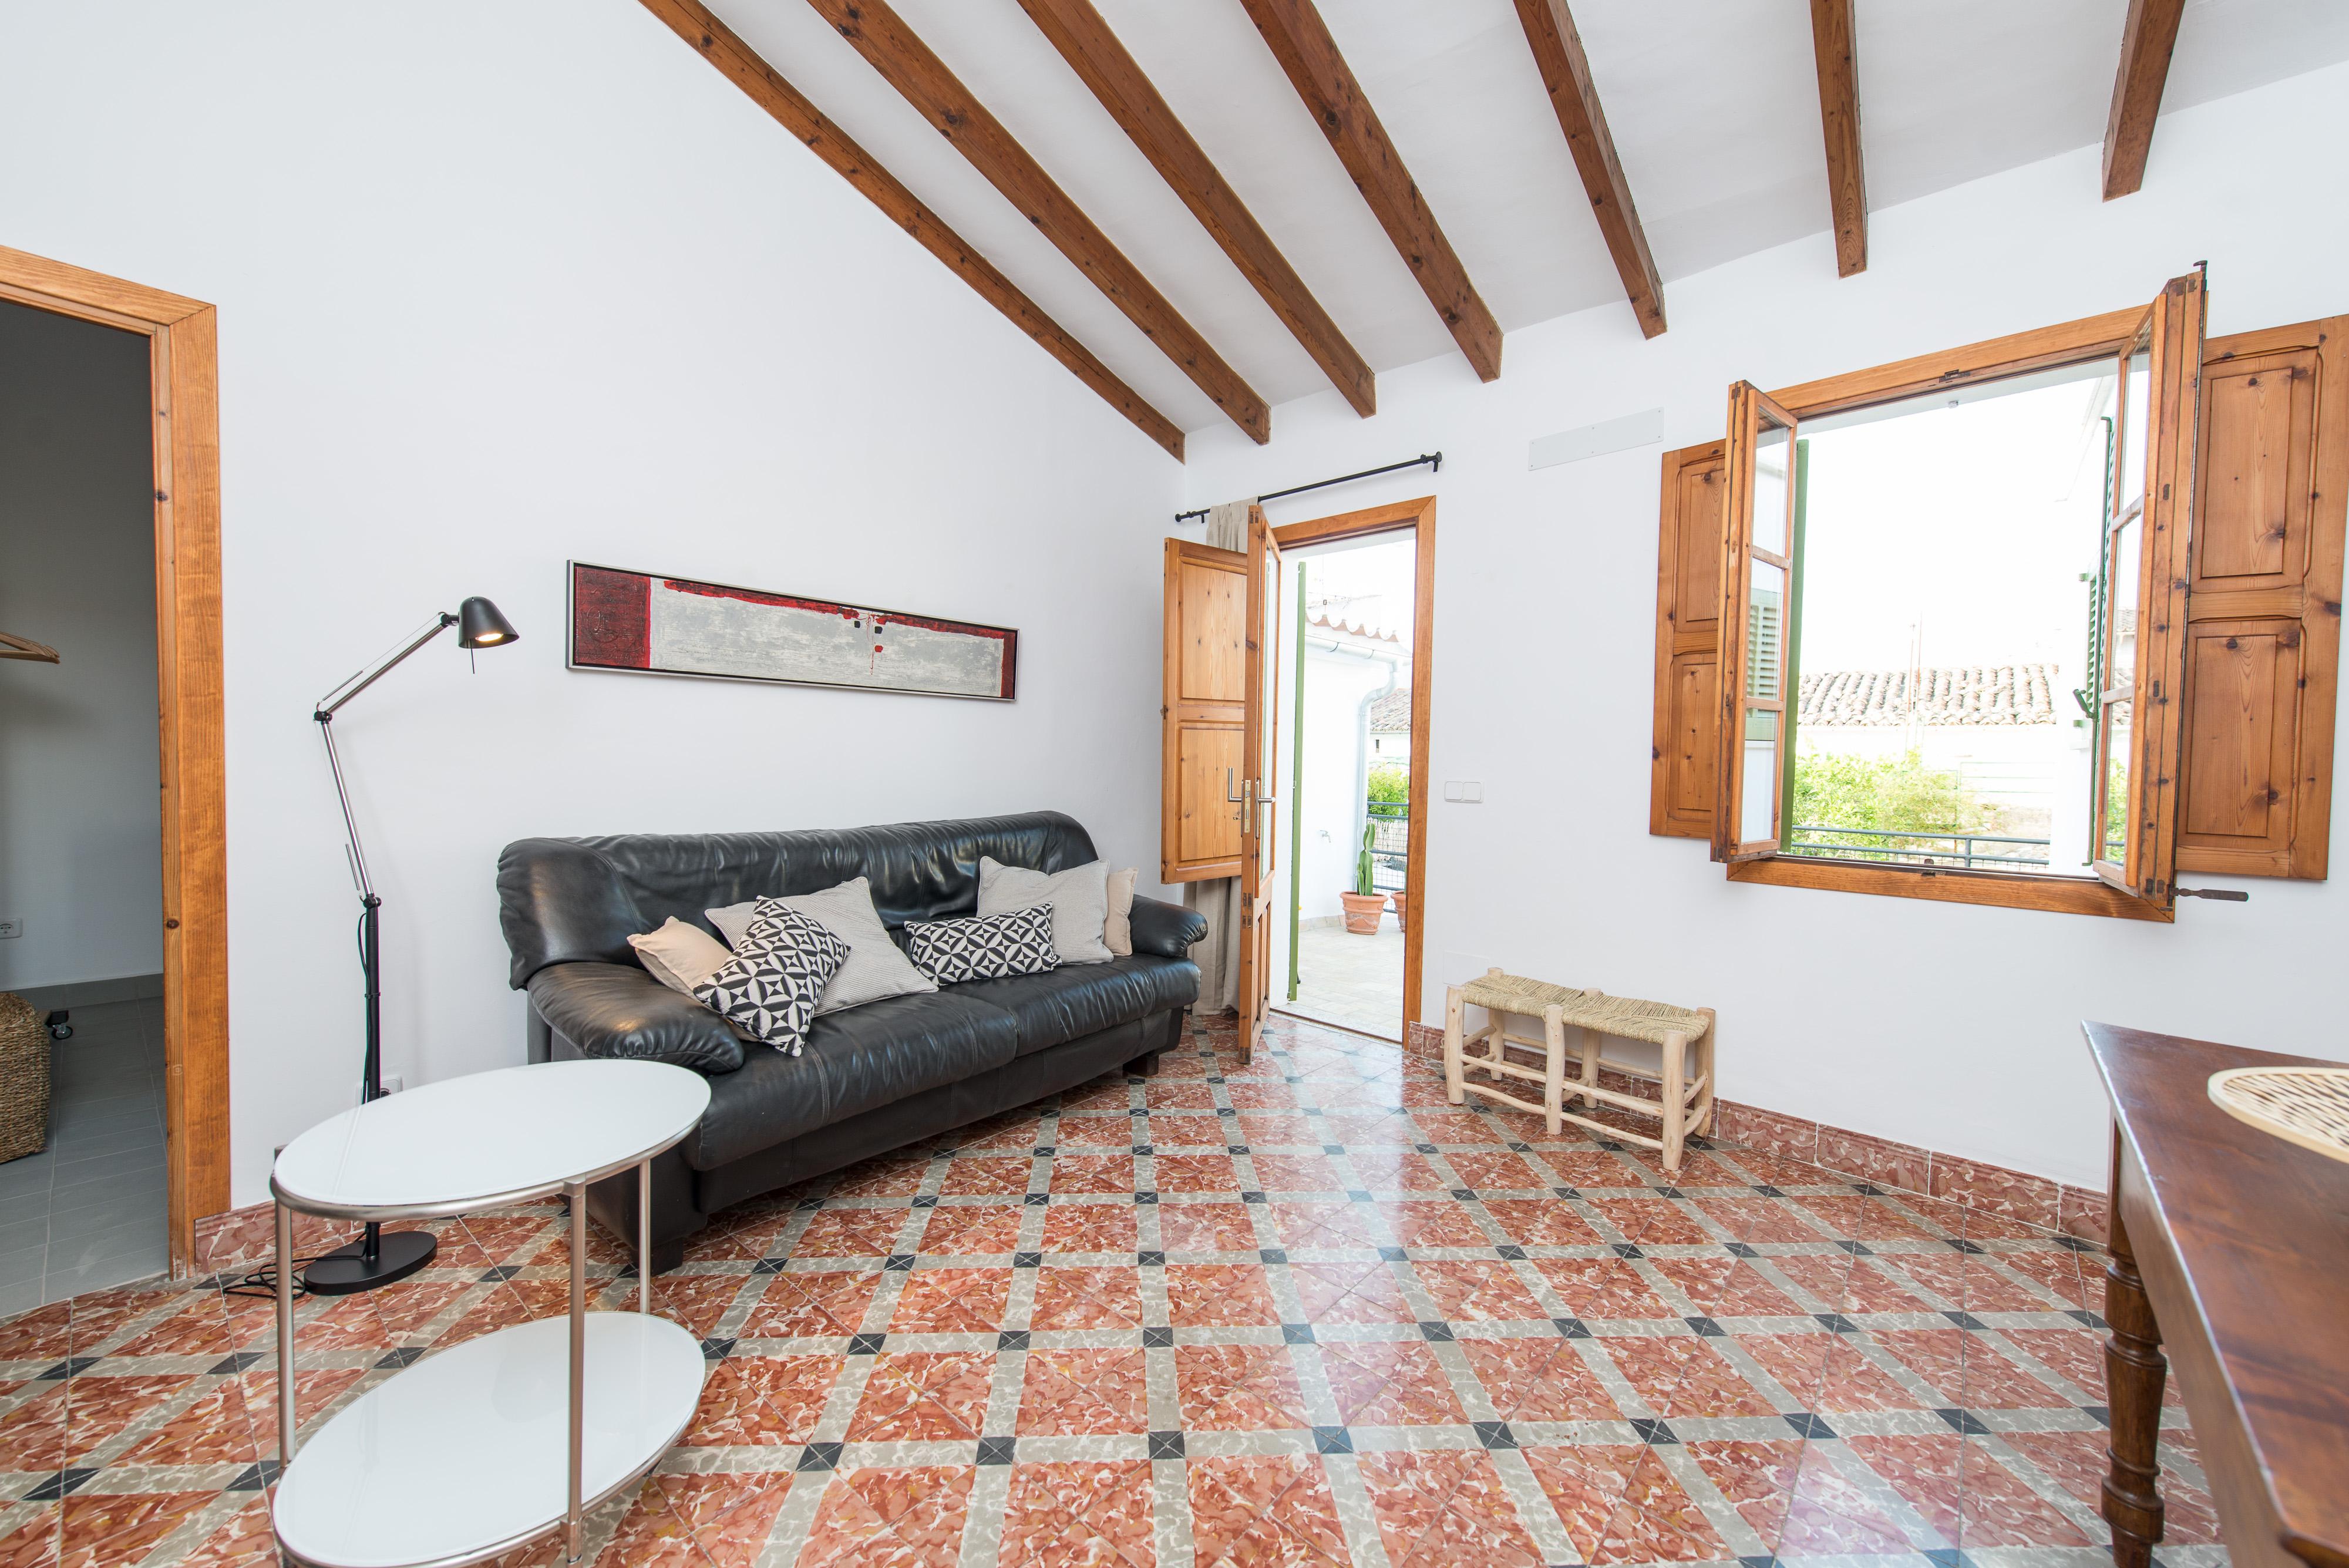 Maison de vacances CA NA MANDOLA (1956247), Alaro, Majorque, Iles Baléares, Espagne, image 15